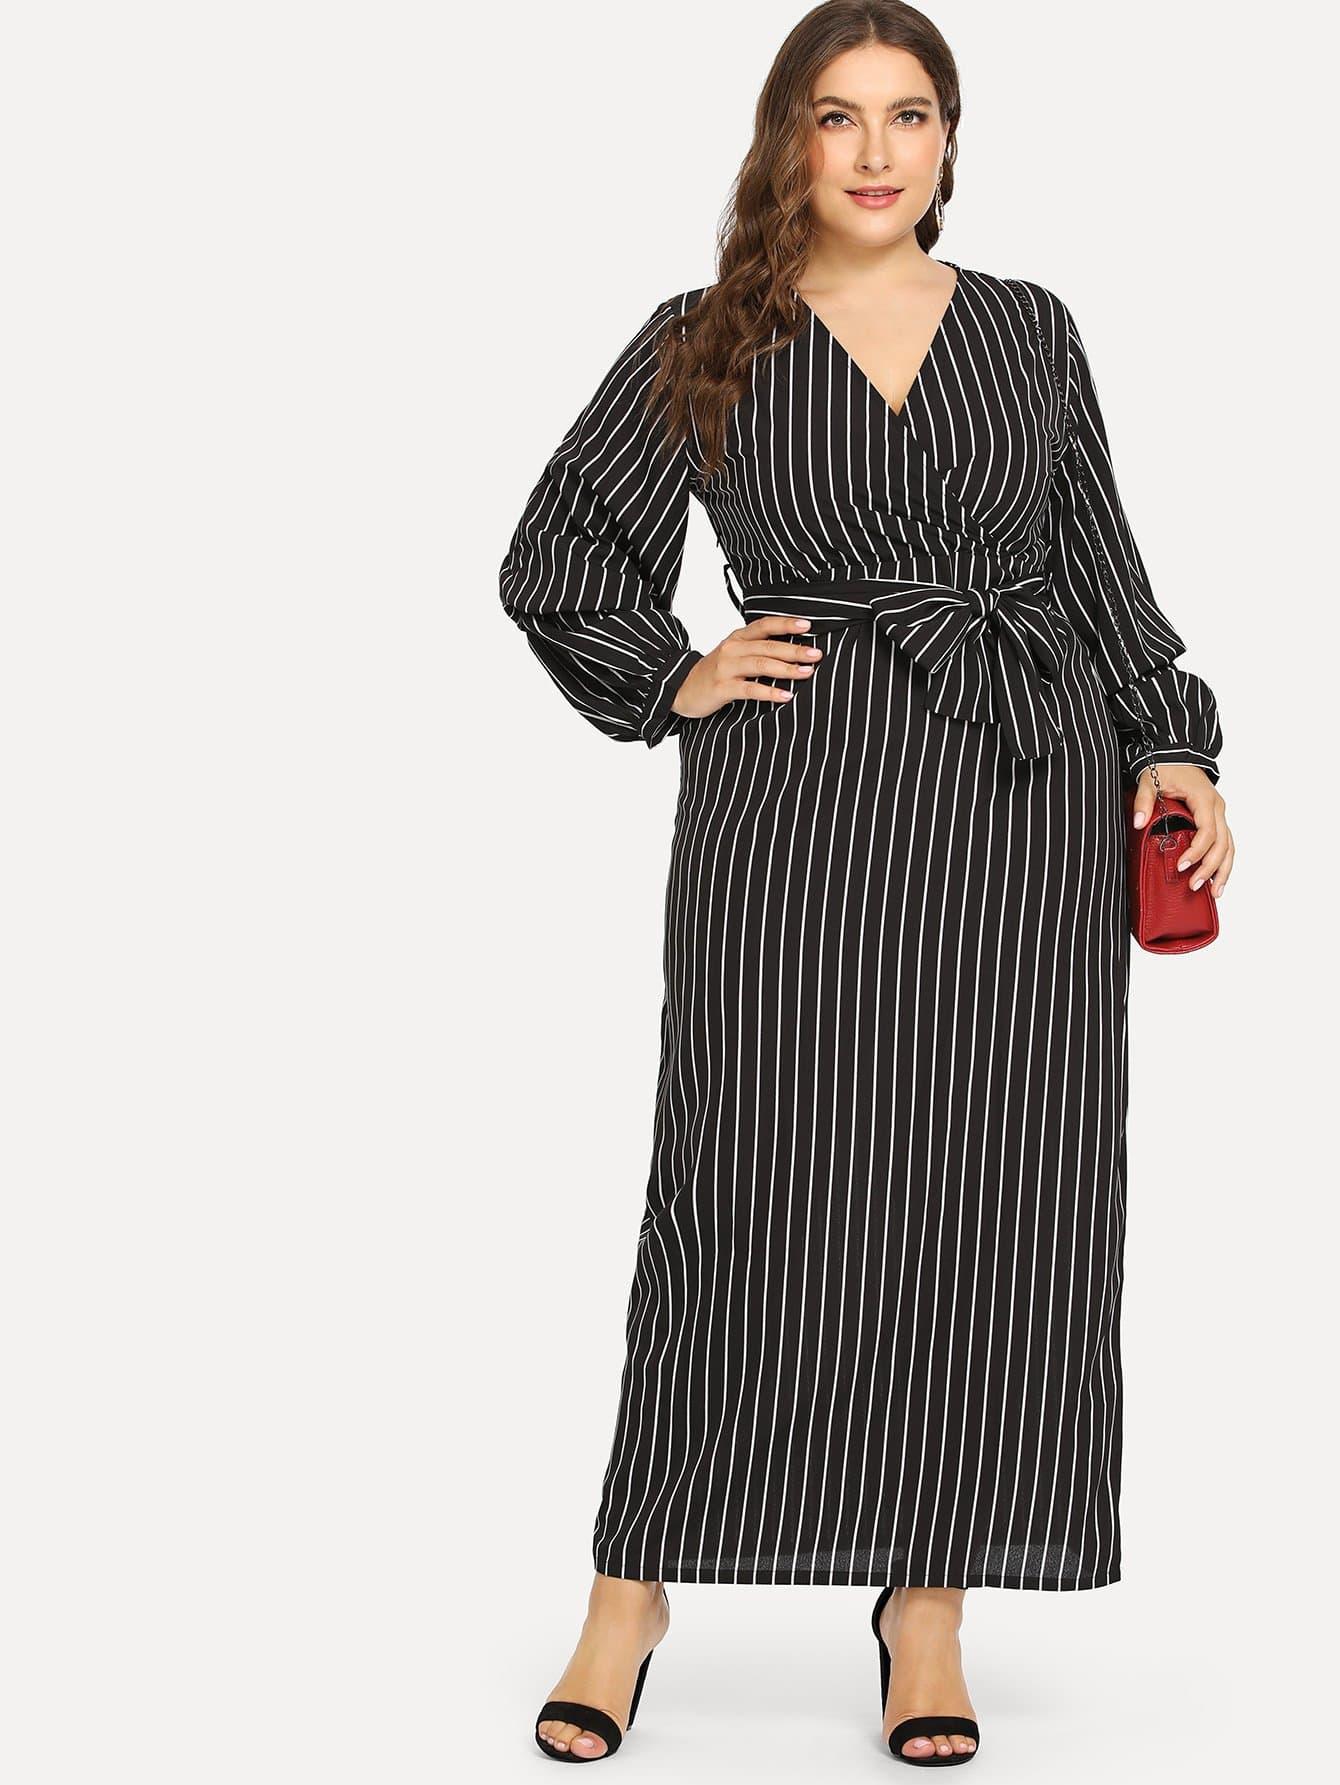 Plus Surplice Belted Striped Dress